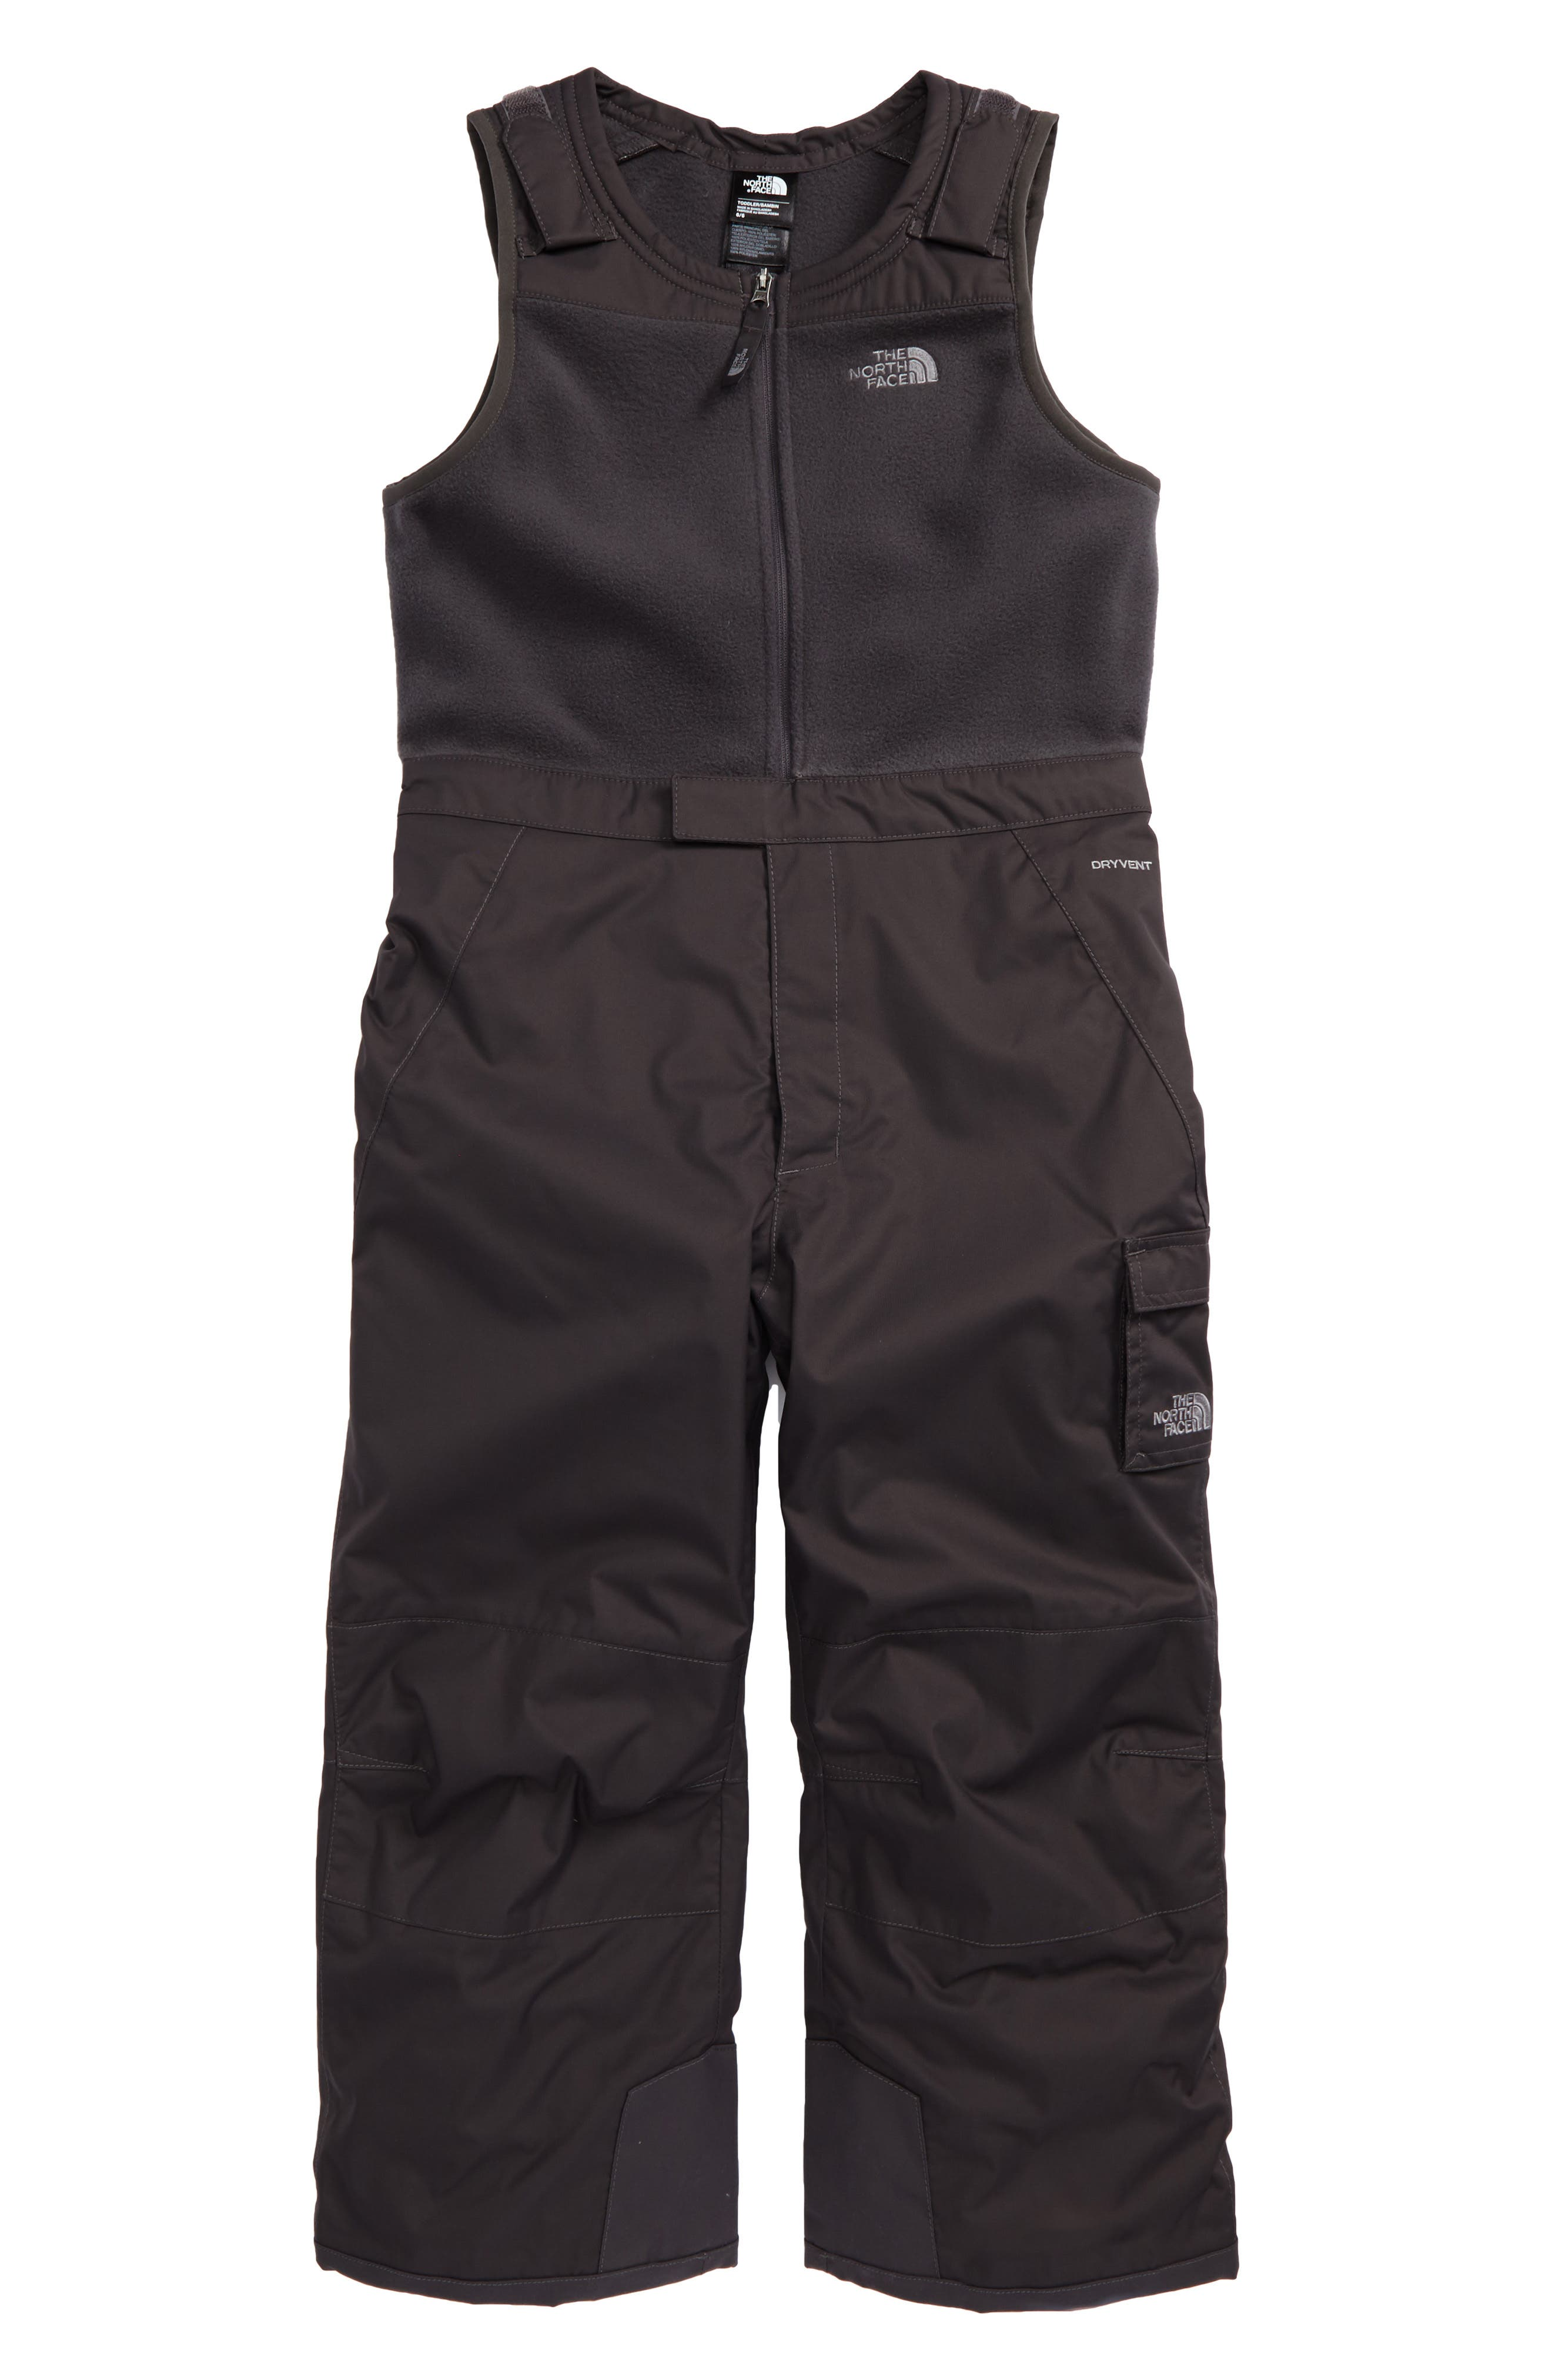 Heekseeker<sup>™</sup> Insulated Waterproof Bib Snowsuit,                             Main thumbnail 1, color,                             021